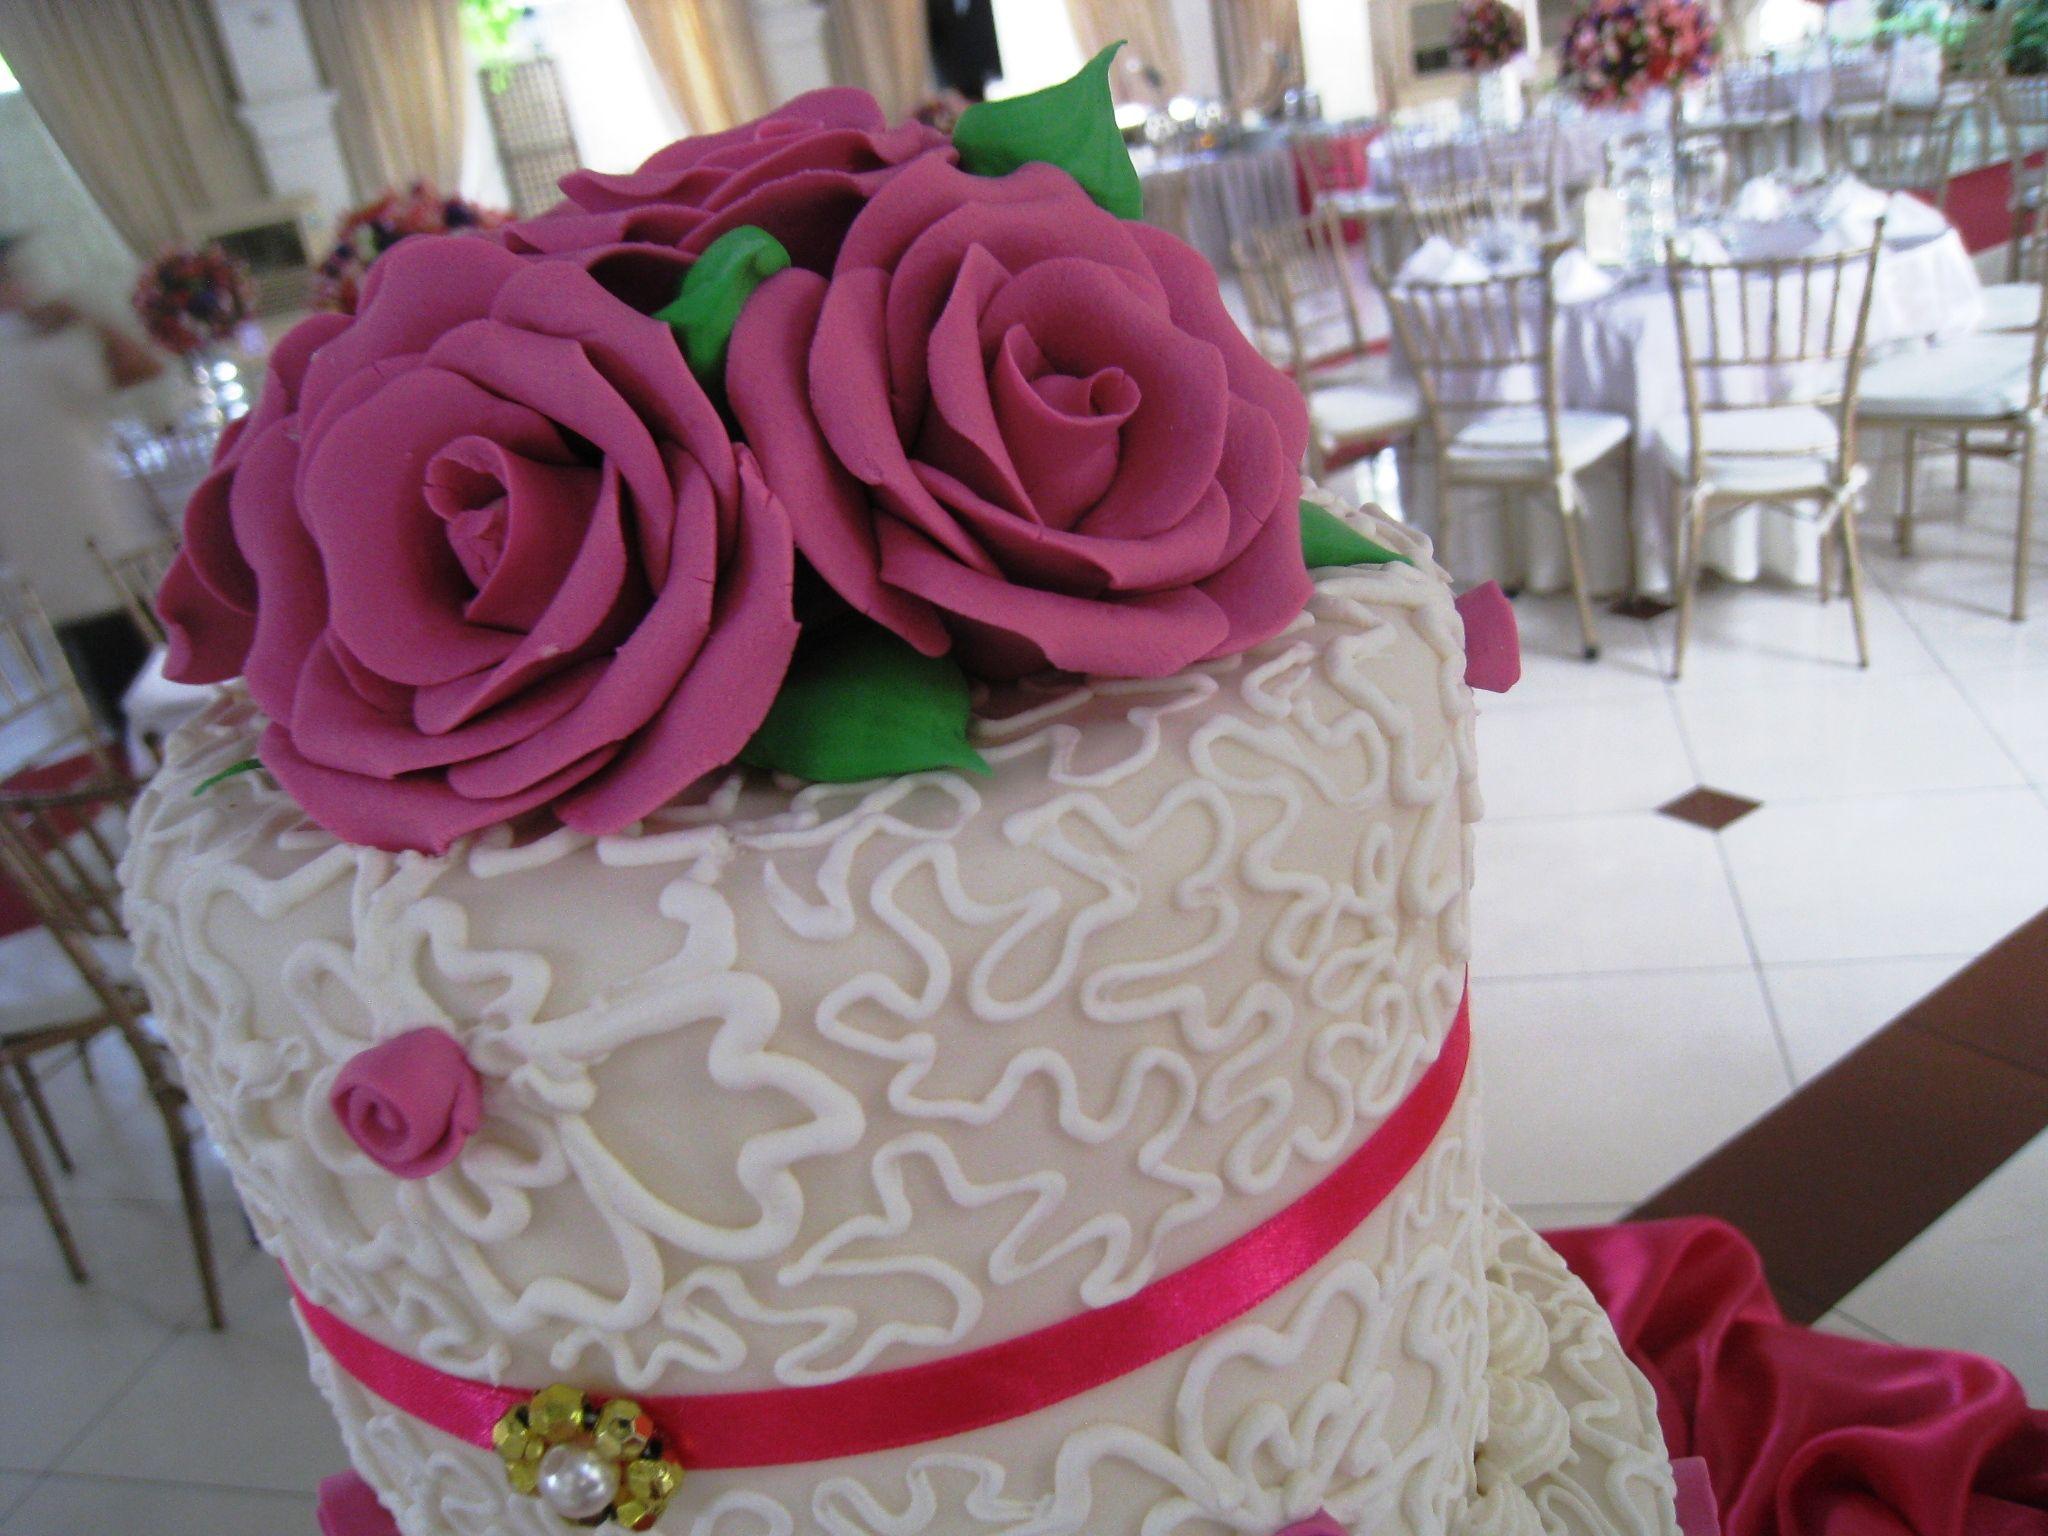 Farver til roserne på kagen